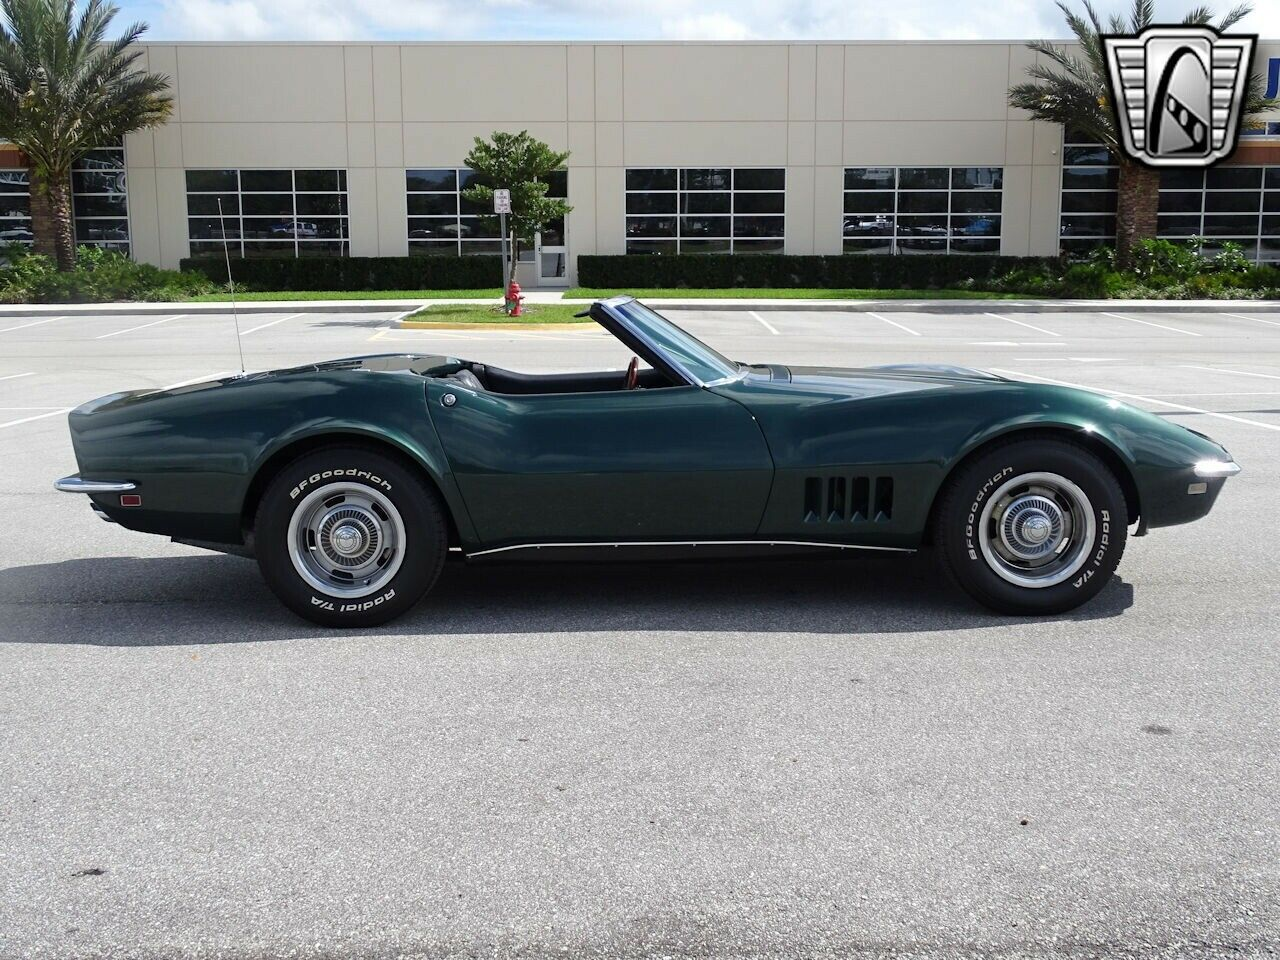 1968 Green Chevrolet Corvette   | C3 Corvette Photo 10